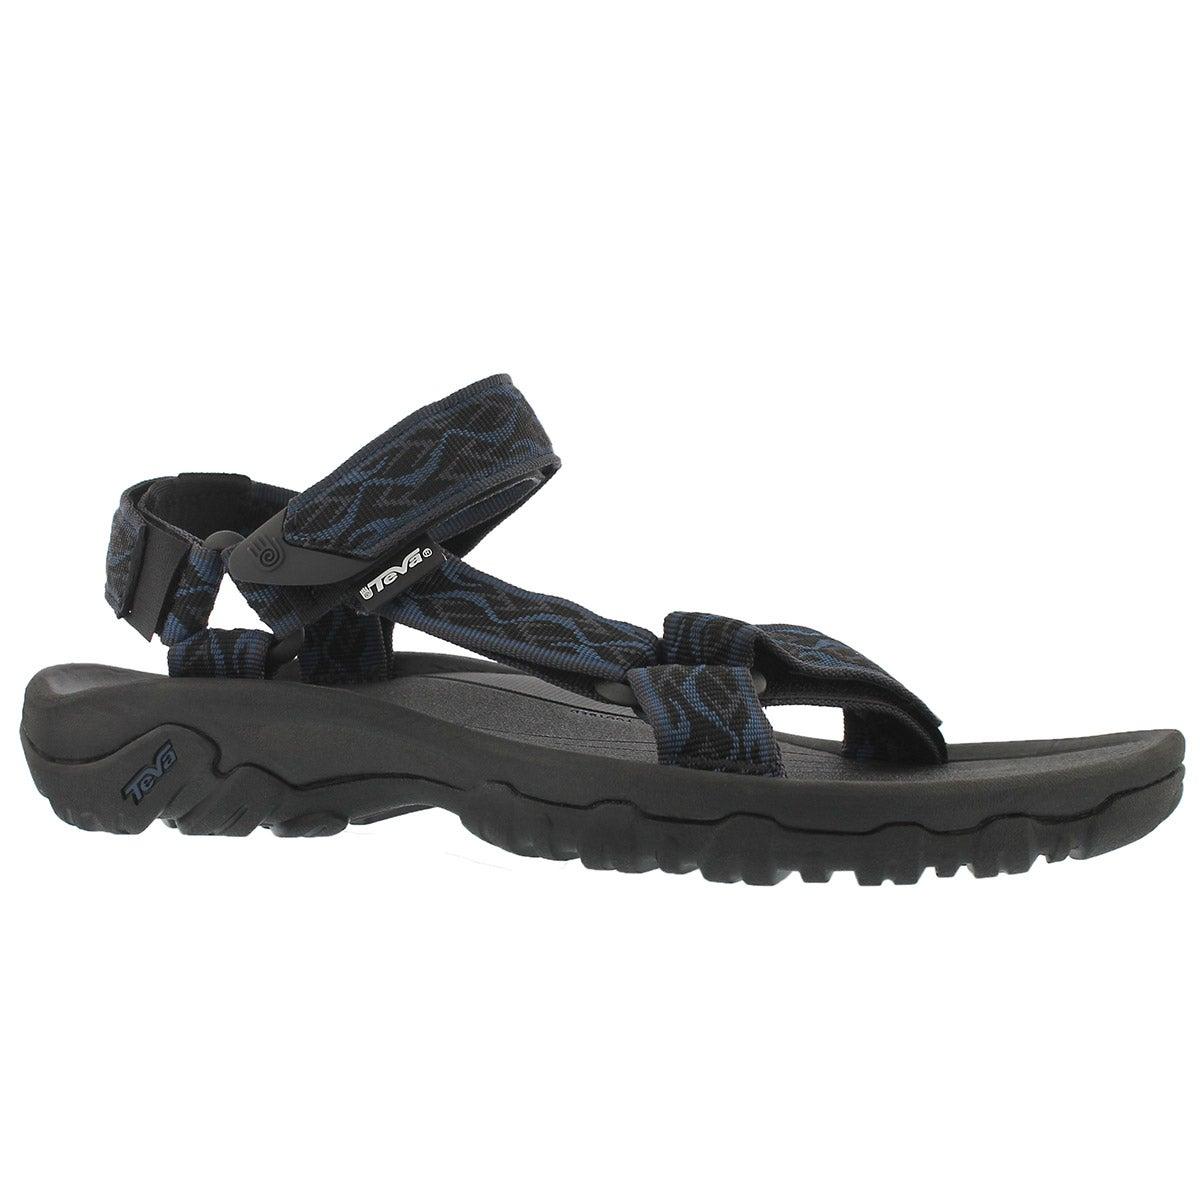 Mns Hurricant XLT blue sport sandal